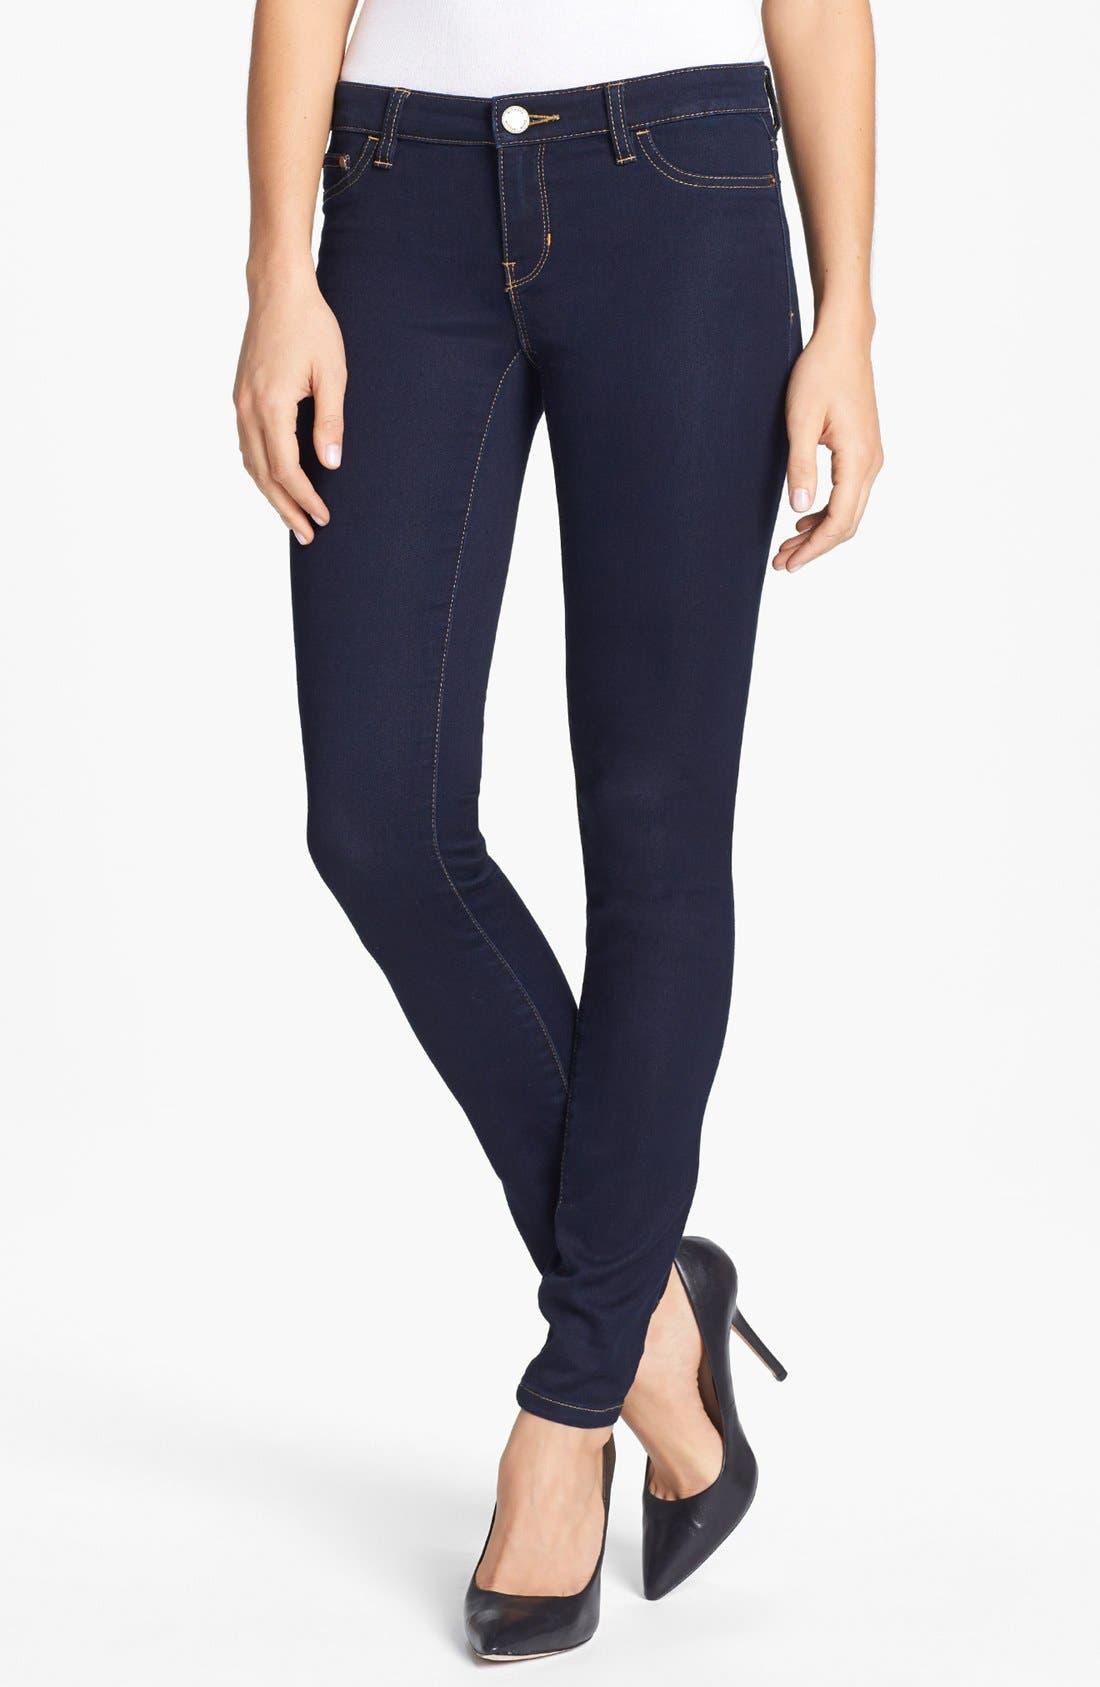 Alternate Image 1 Selected - MICHAEL Michael Kors Stretch Skinny Jeans (Twilight) (Petite)